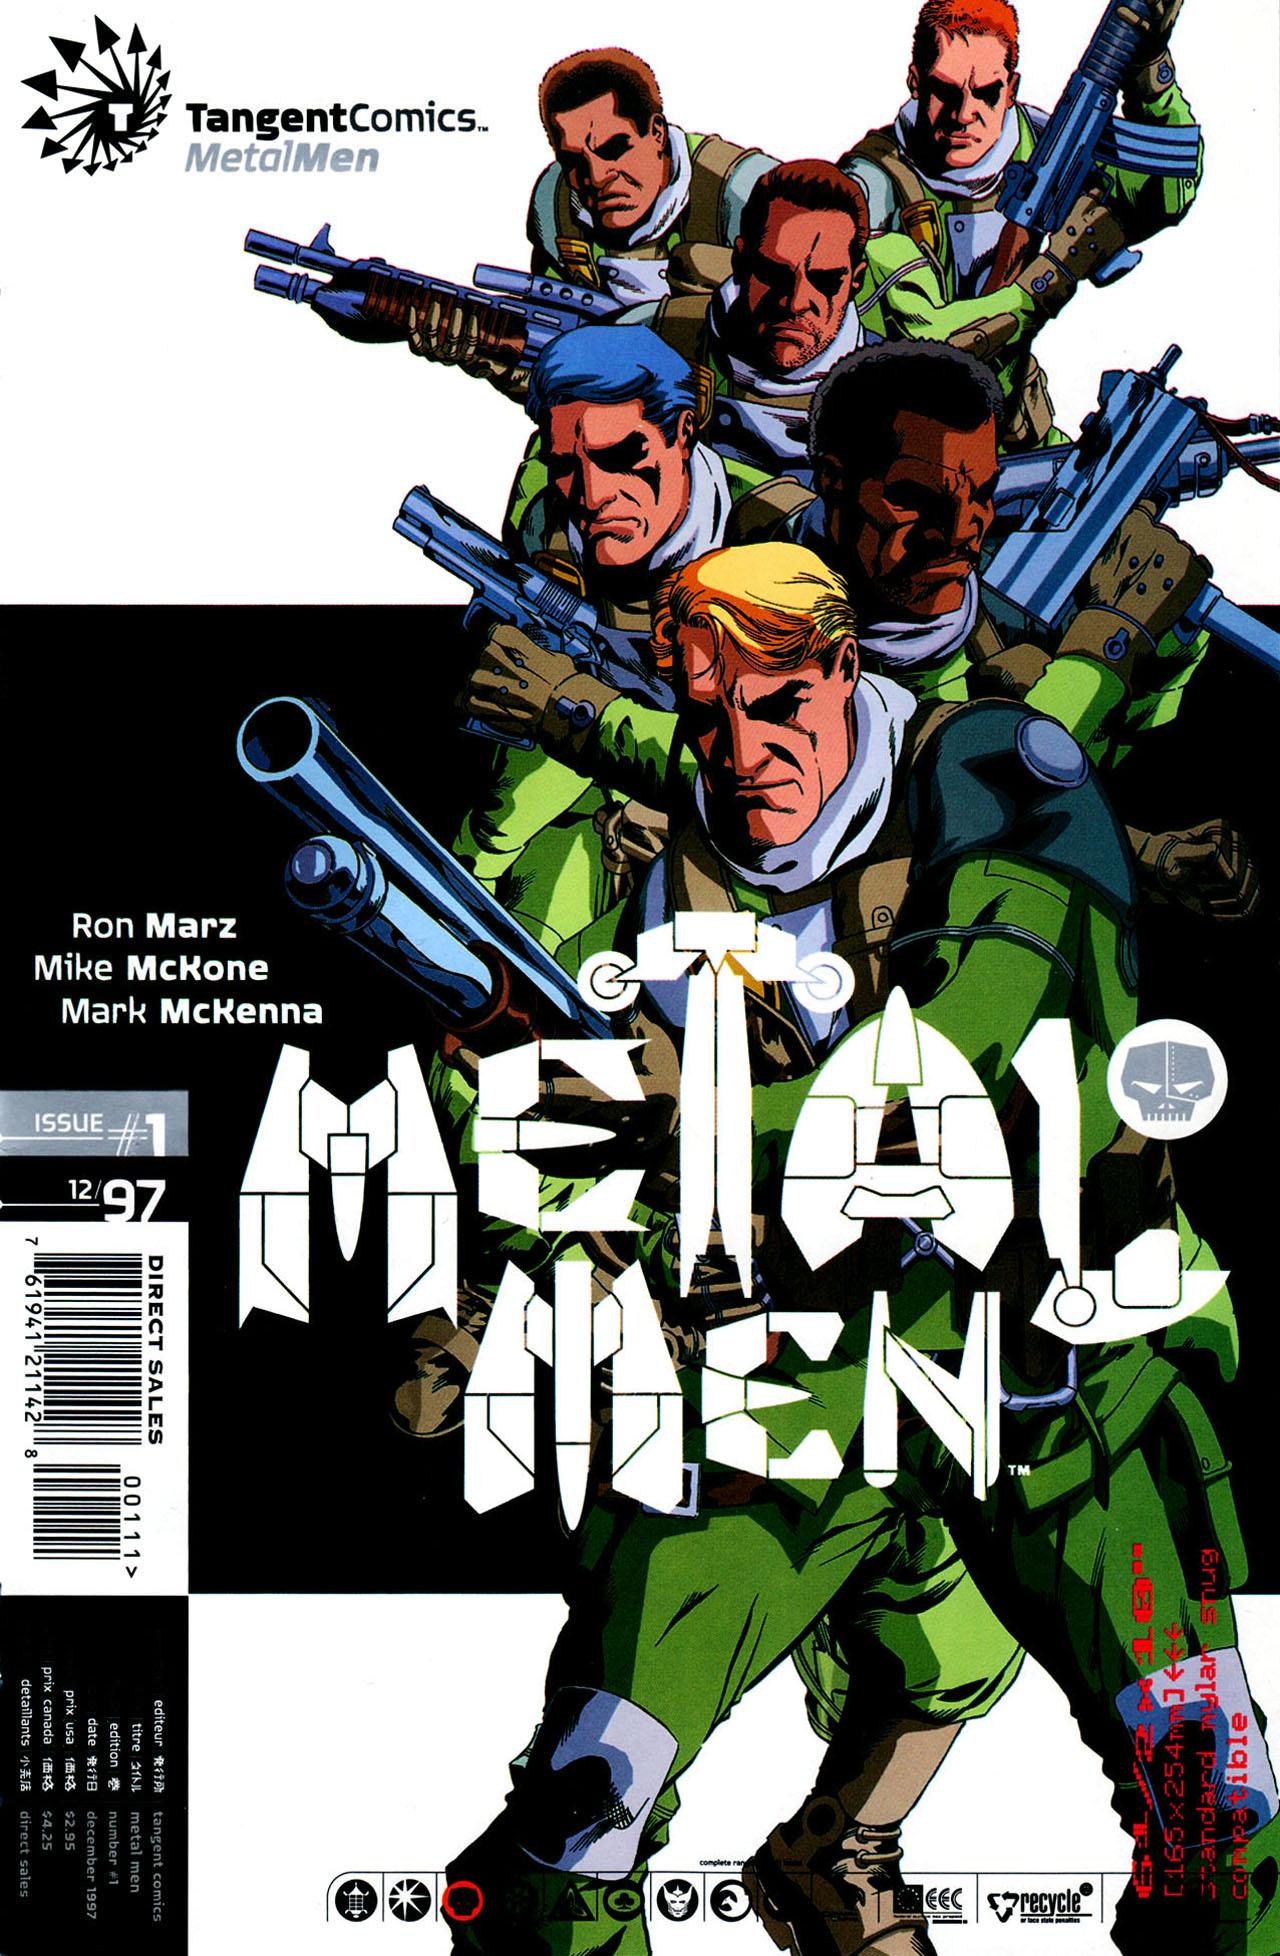 Read online Tangent Comics/ Metal Men comic -  Issue # Full - 1